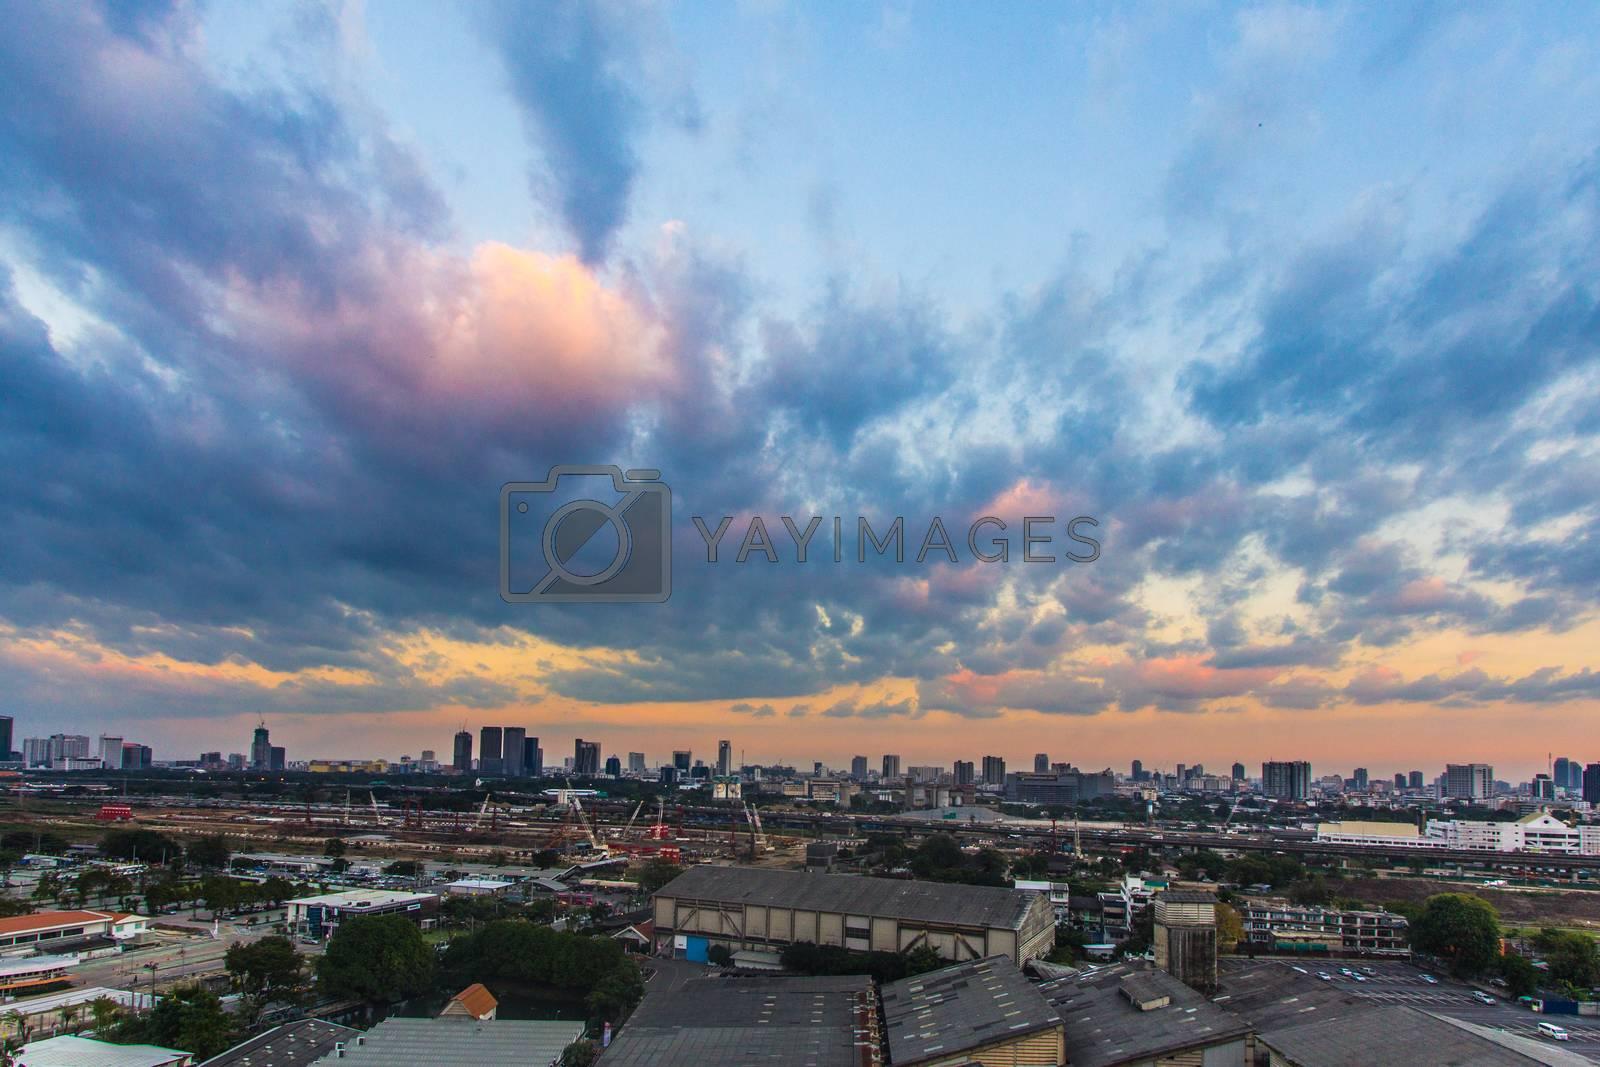 Royalty free image of Sunset over Bangkok City  by kritsada1992